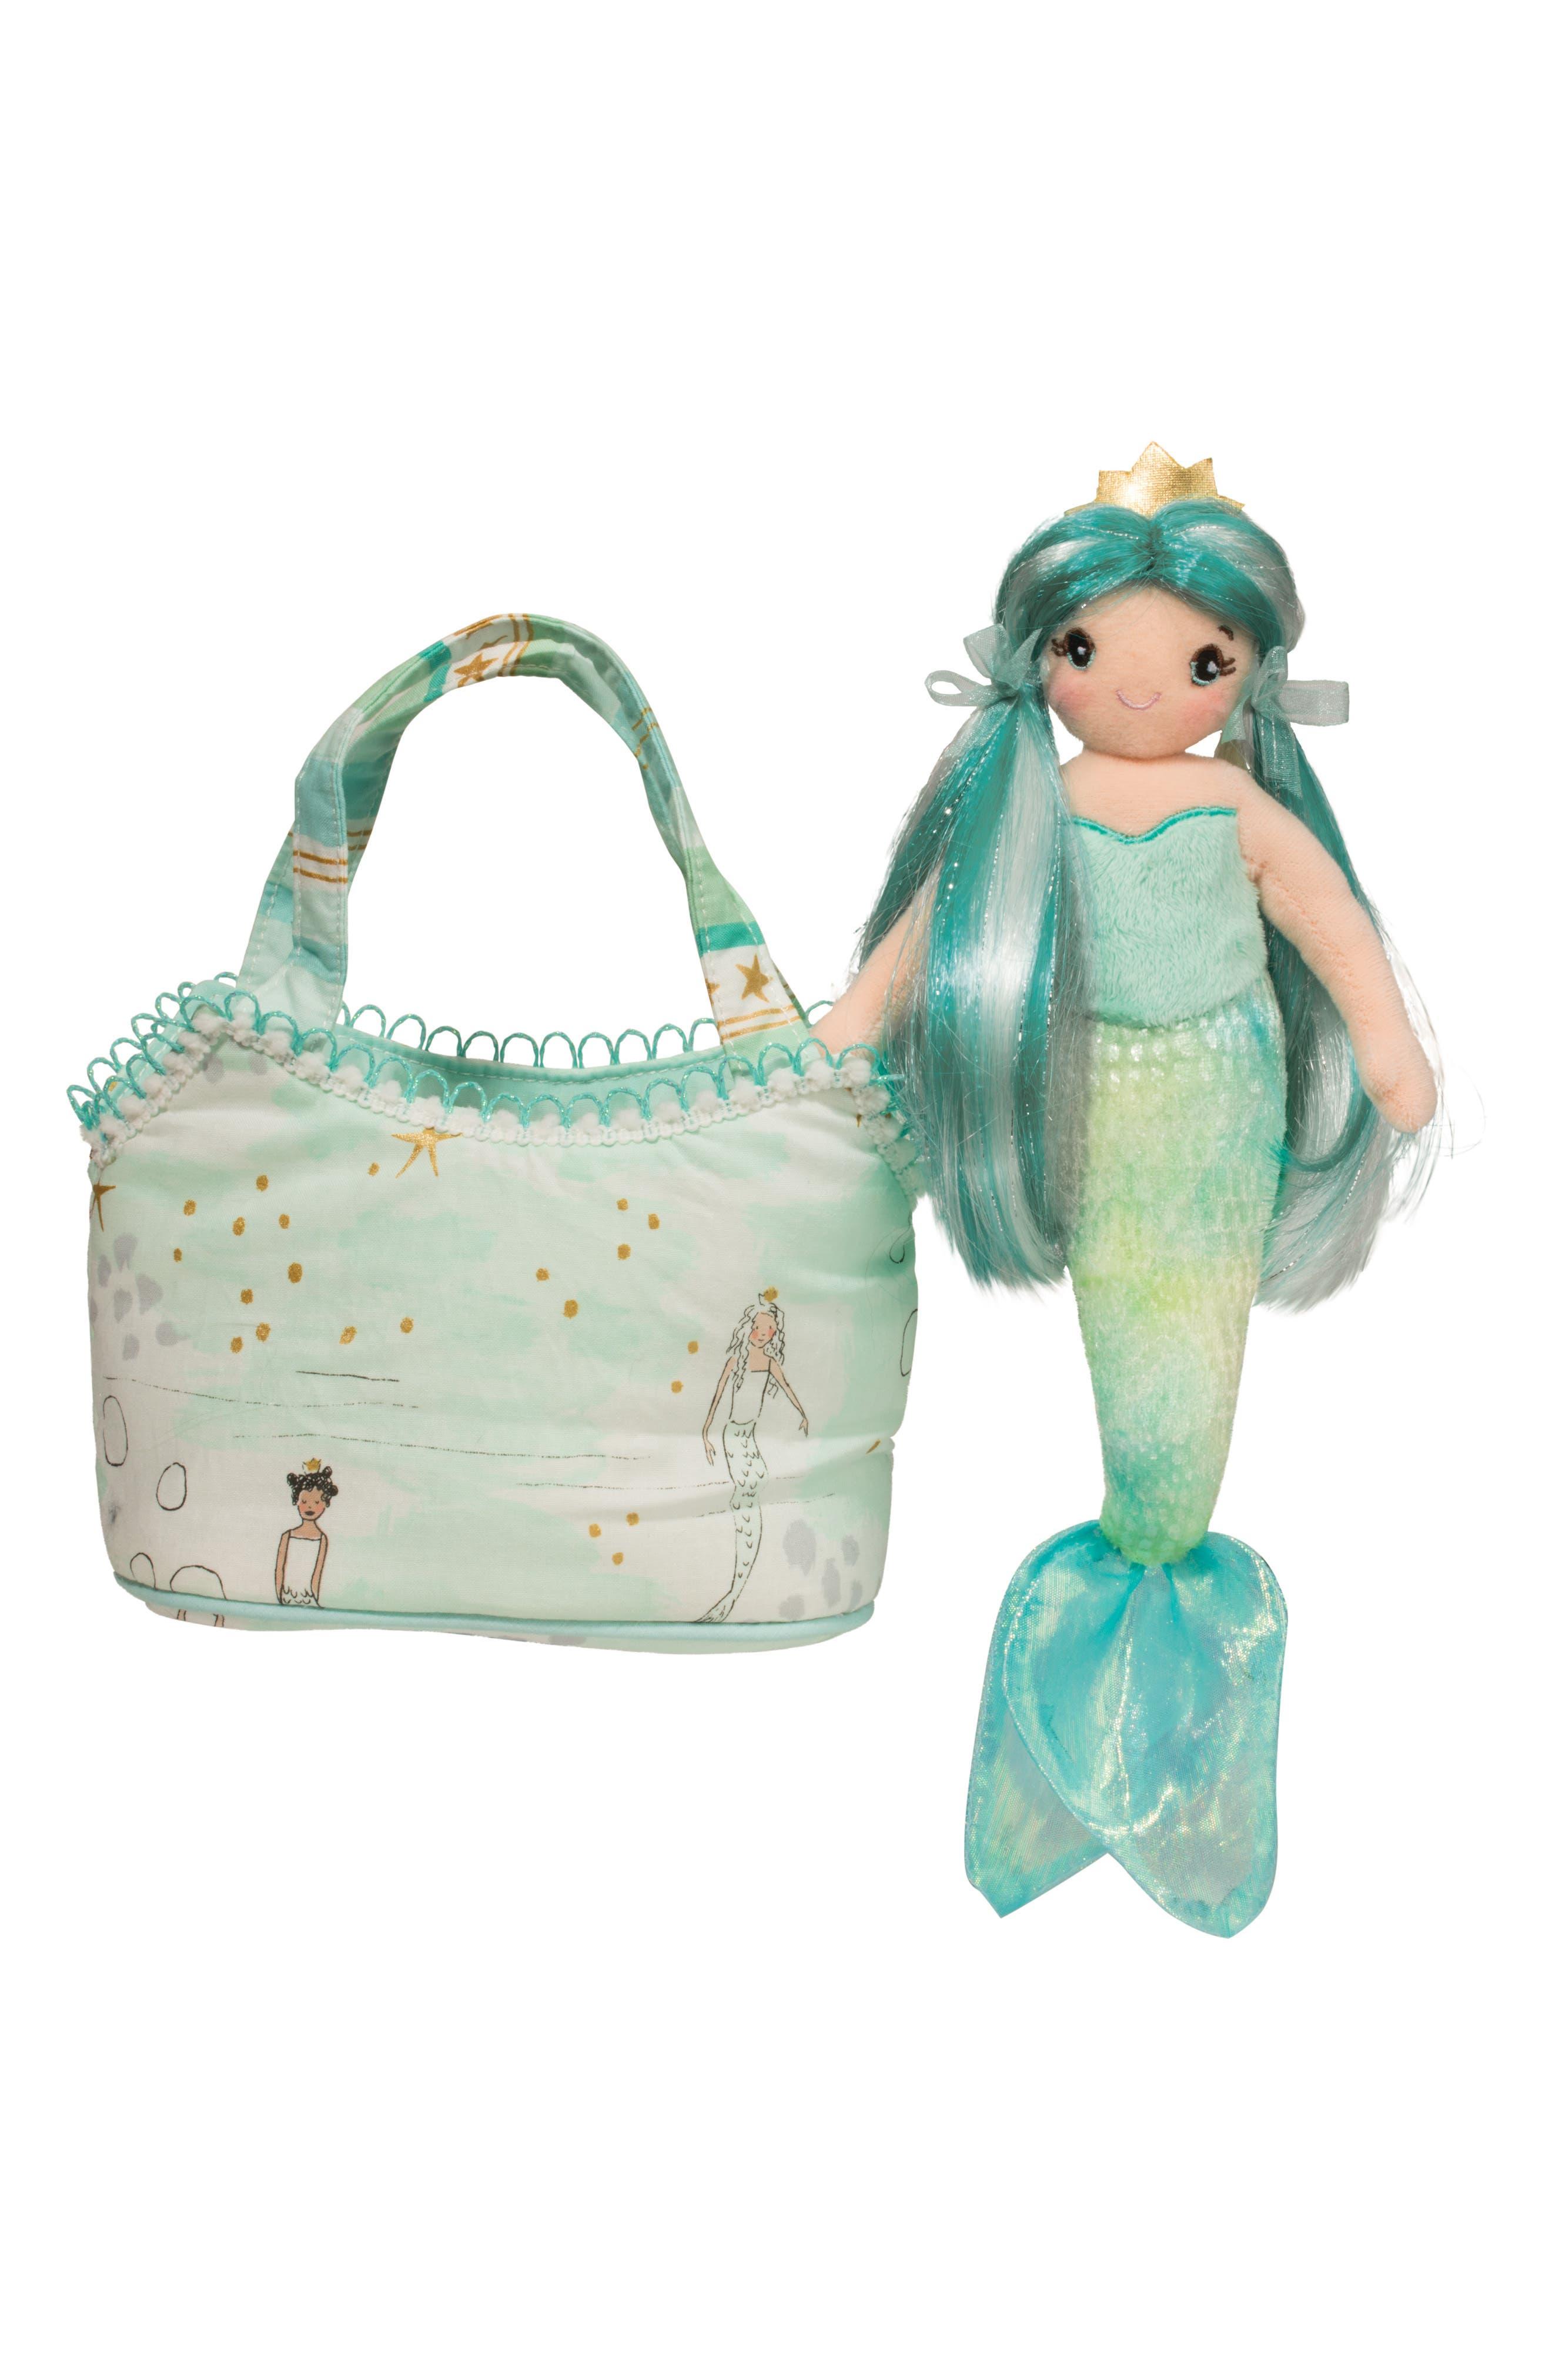 Alternate Image 1 Selected - Douglas Princess Mermaid Doll & Handbag